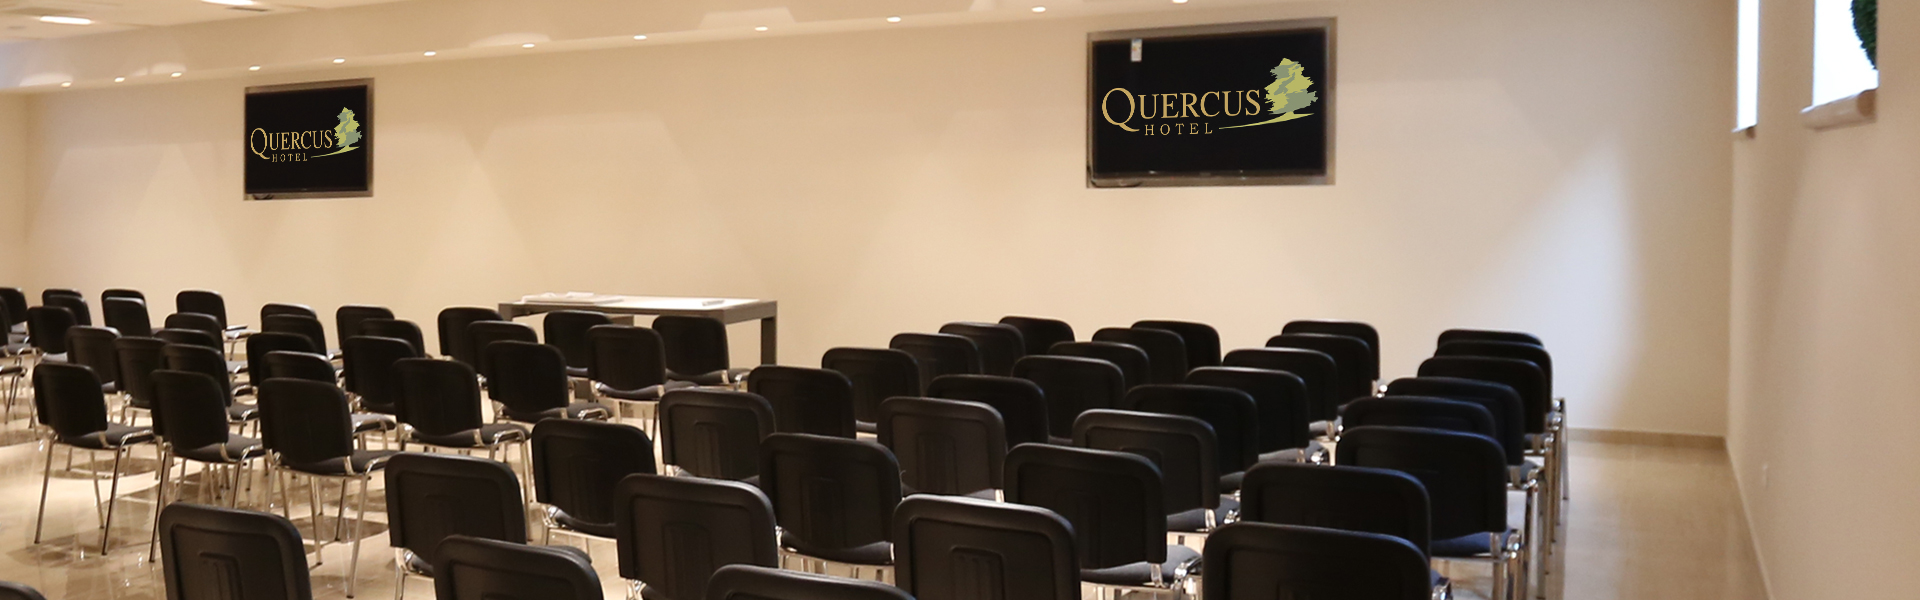 Hotel Quercus Meeting Room